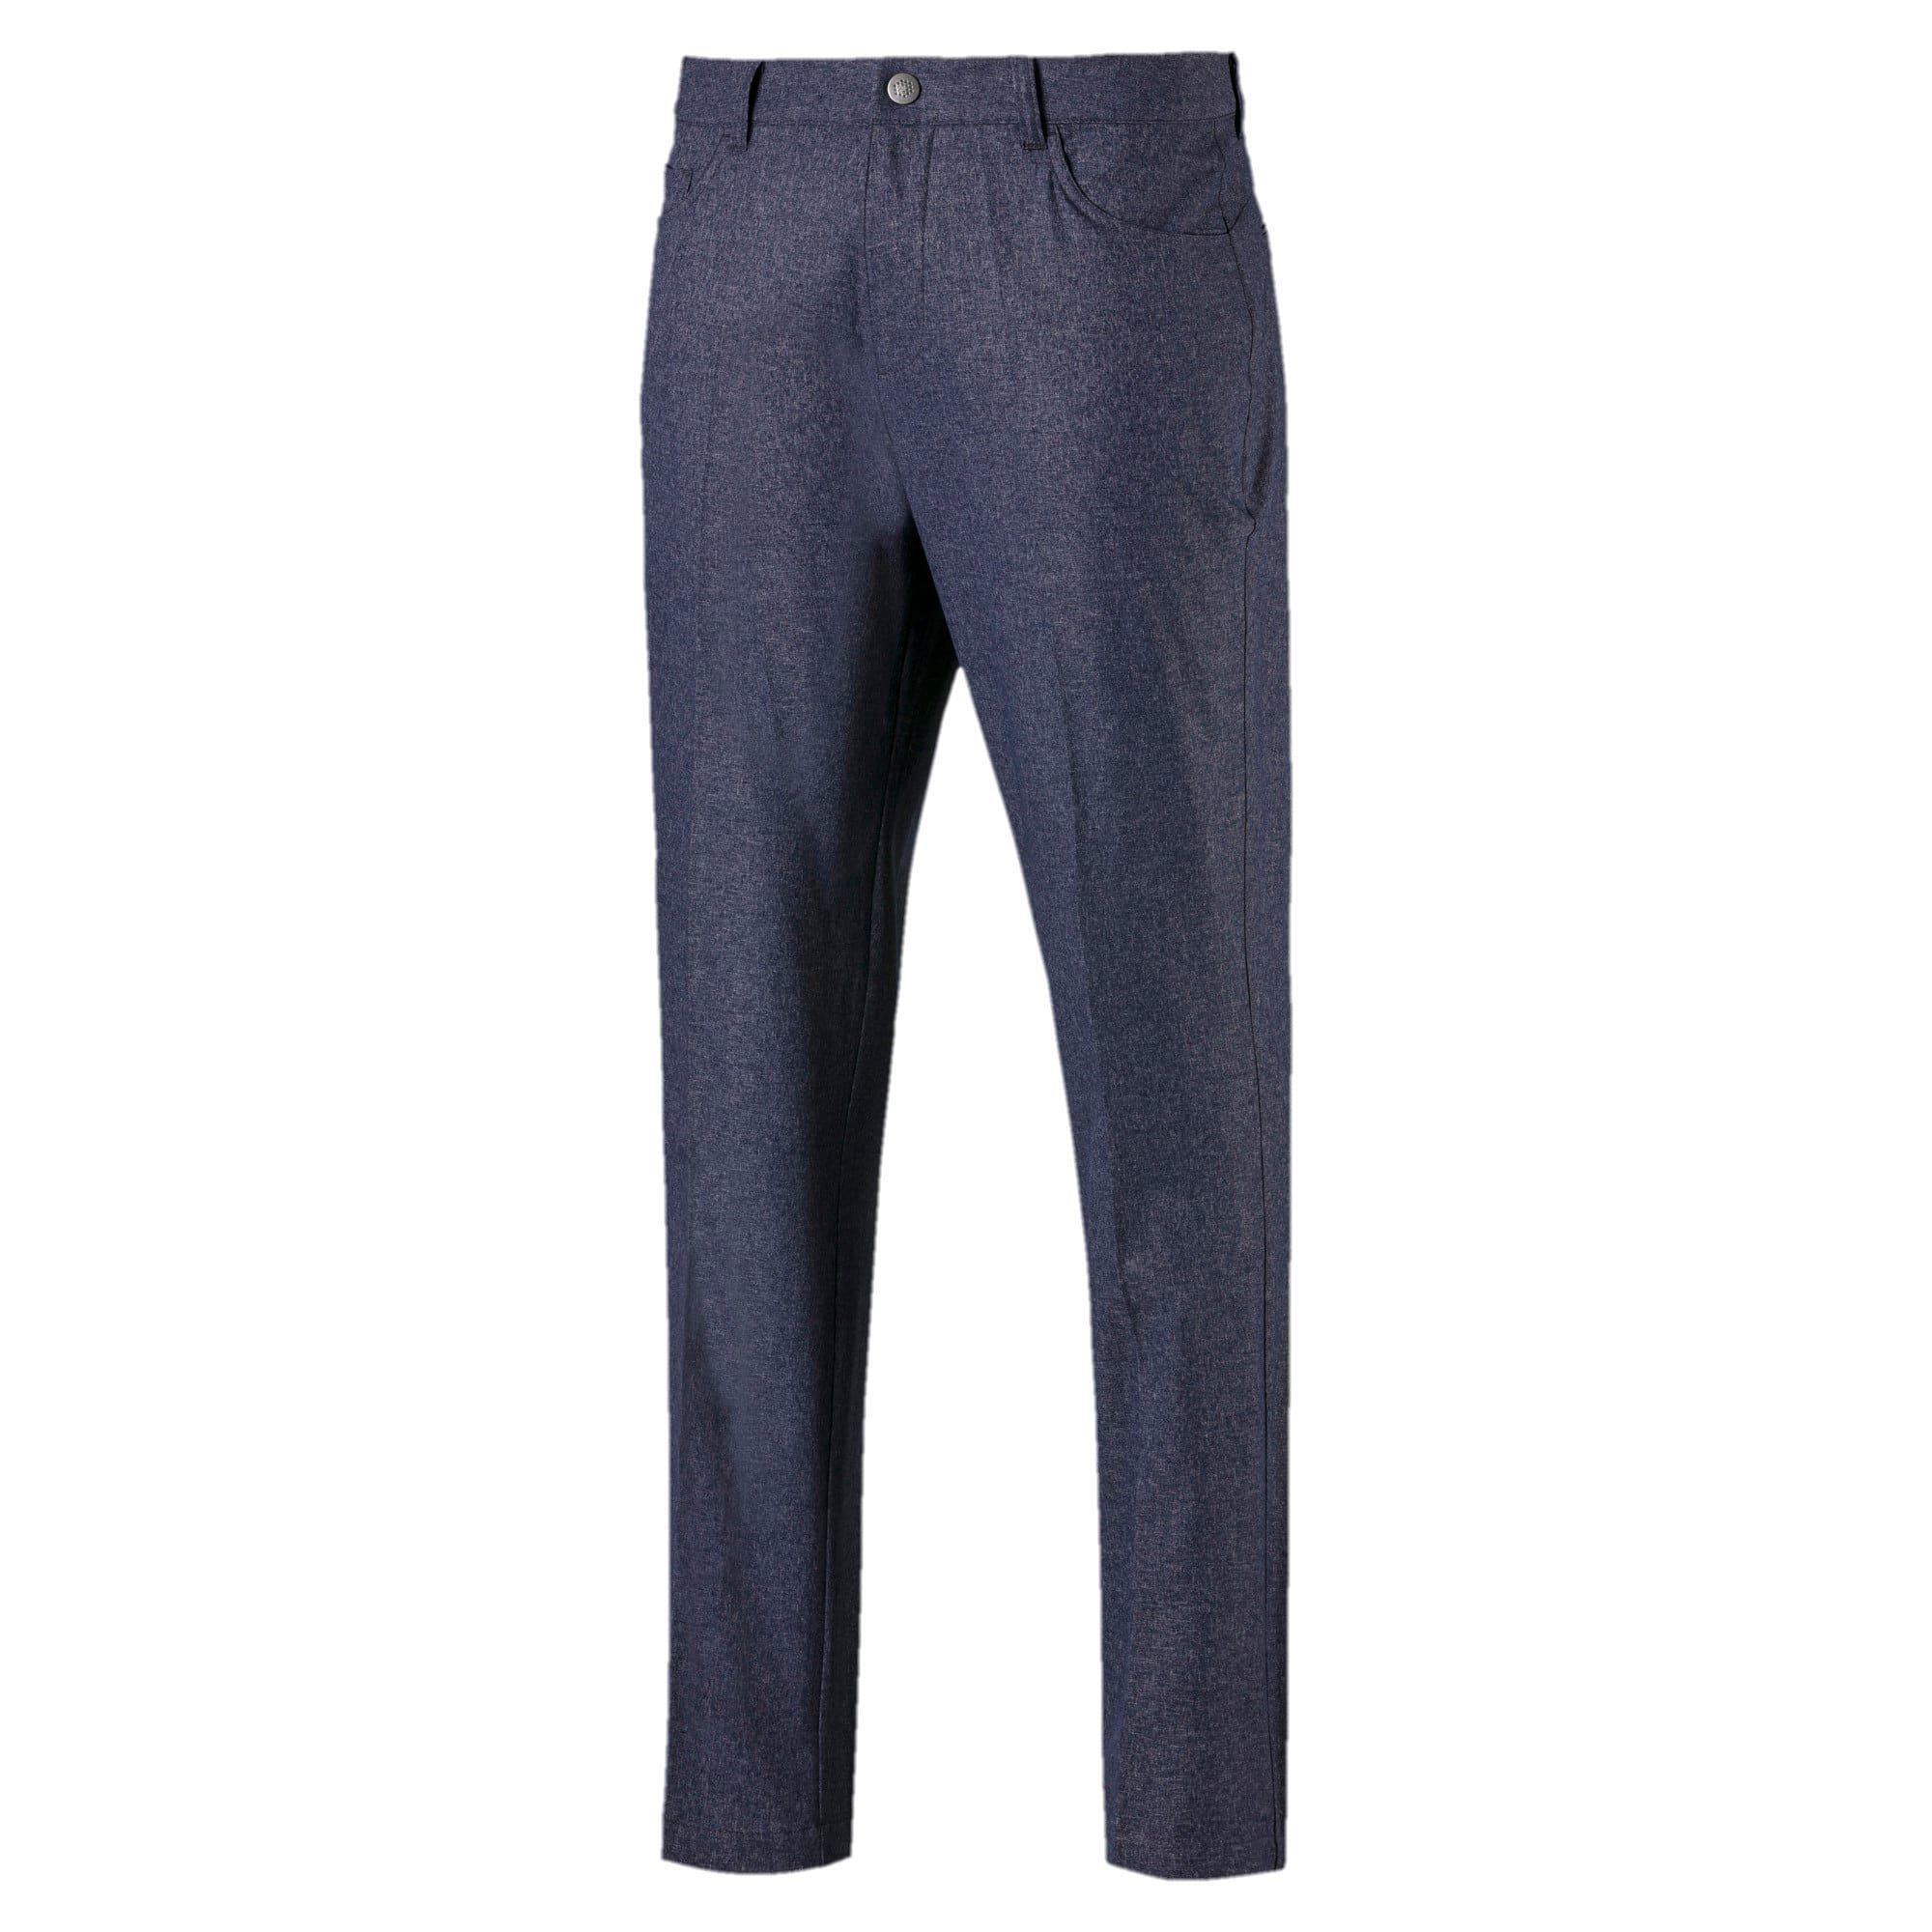 PUMA Jackpot 5 Pocket Heather Mens Golf Pants in Peacoat size 2930